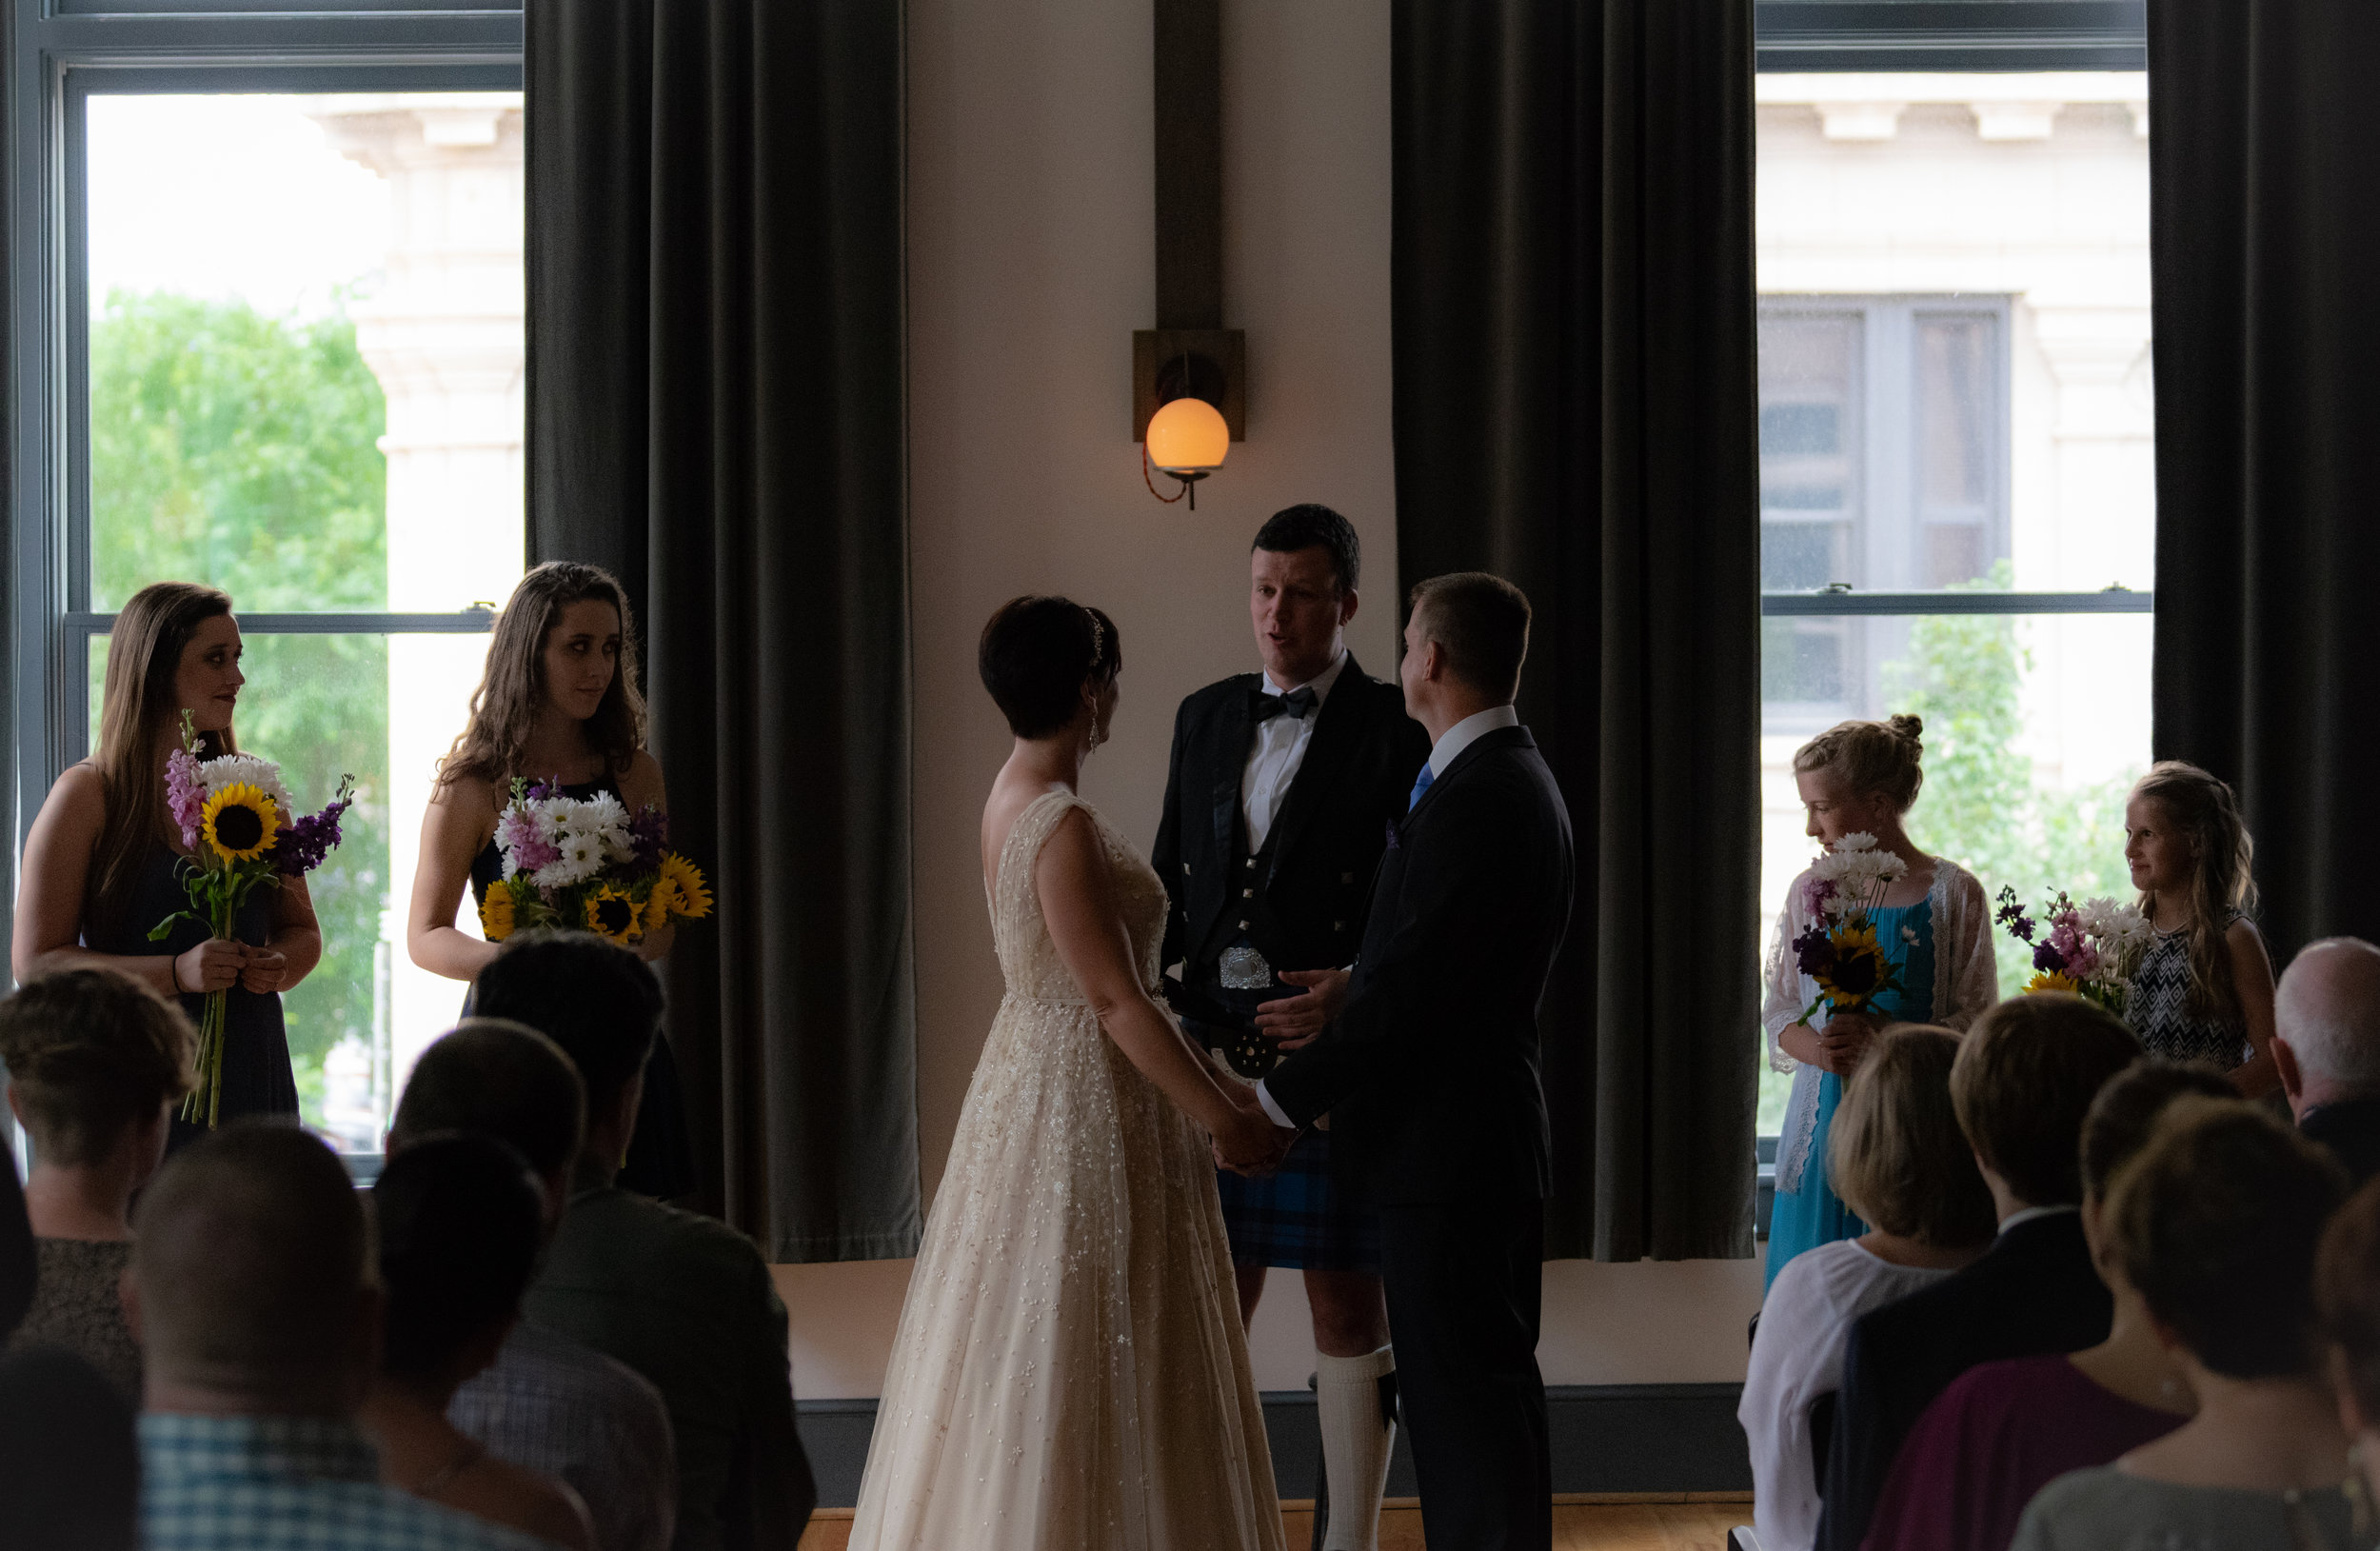 R&B_wedding_pictures-19.jpg